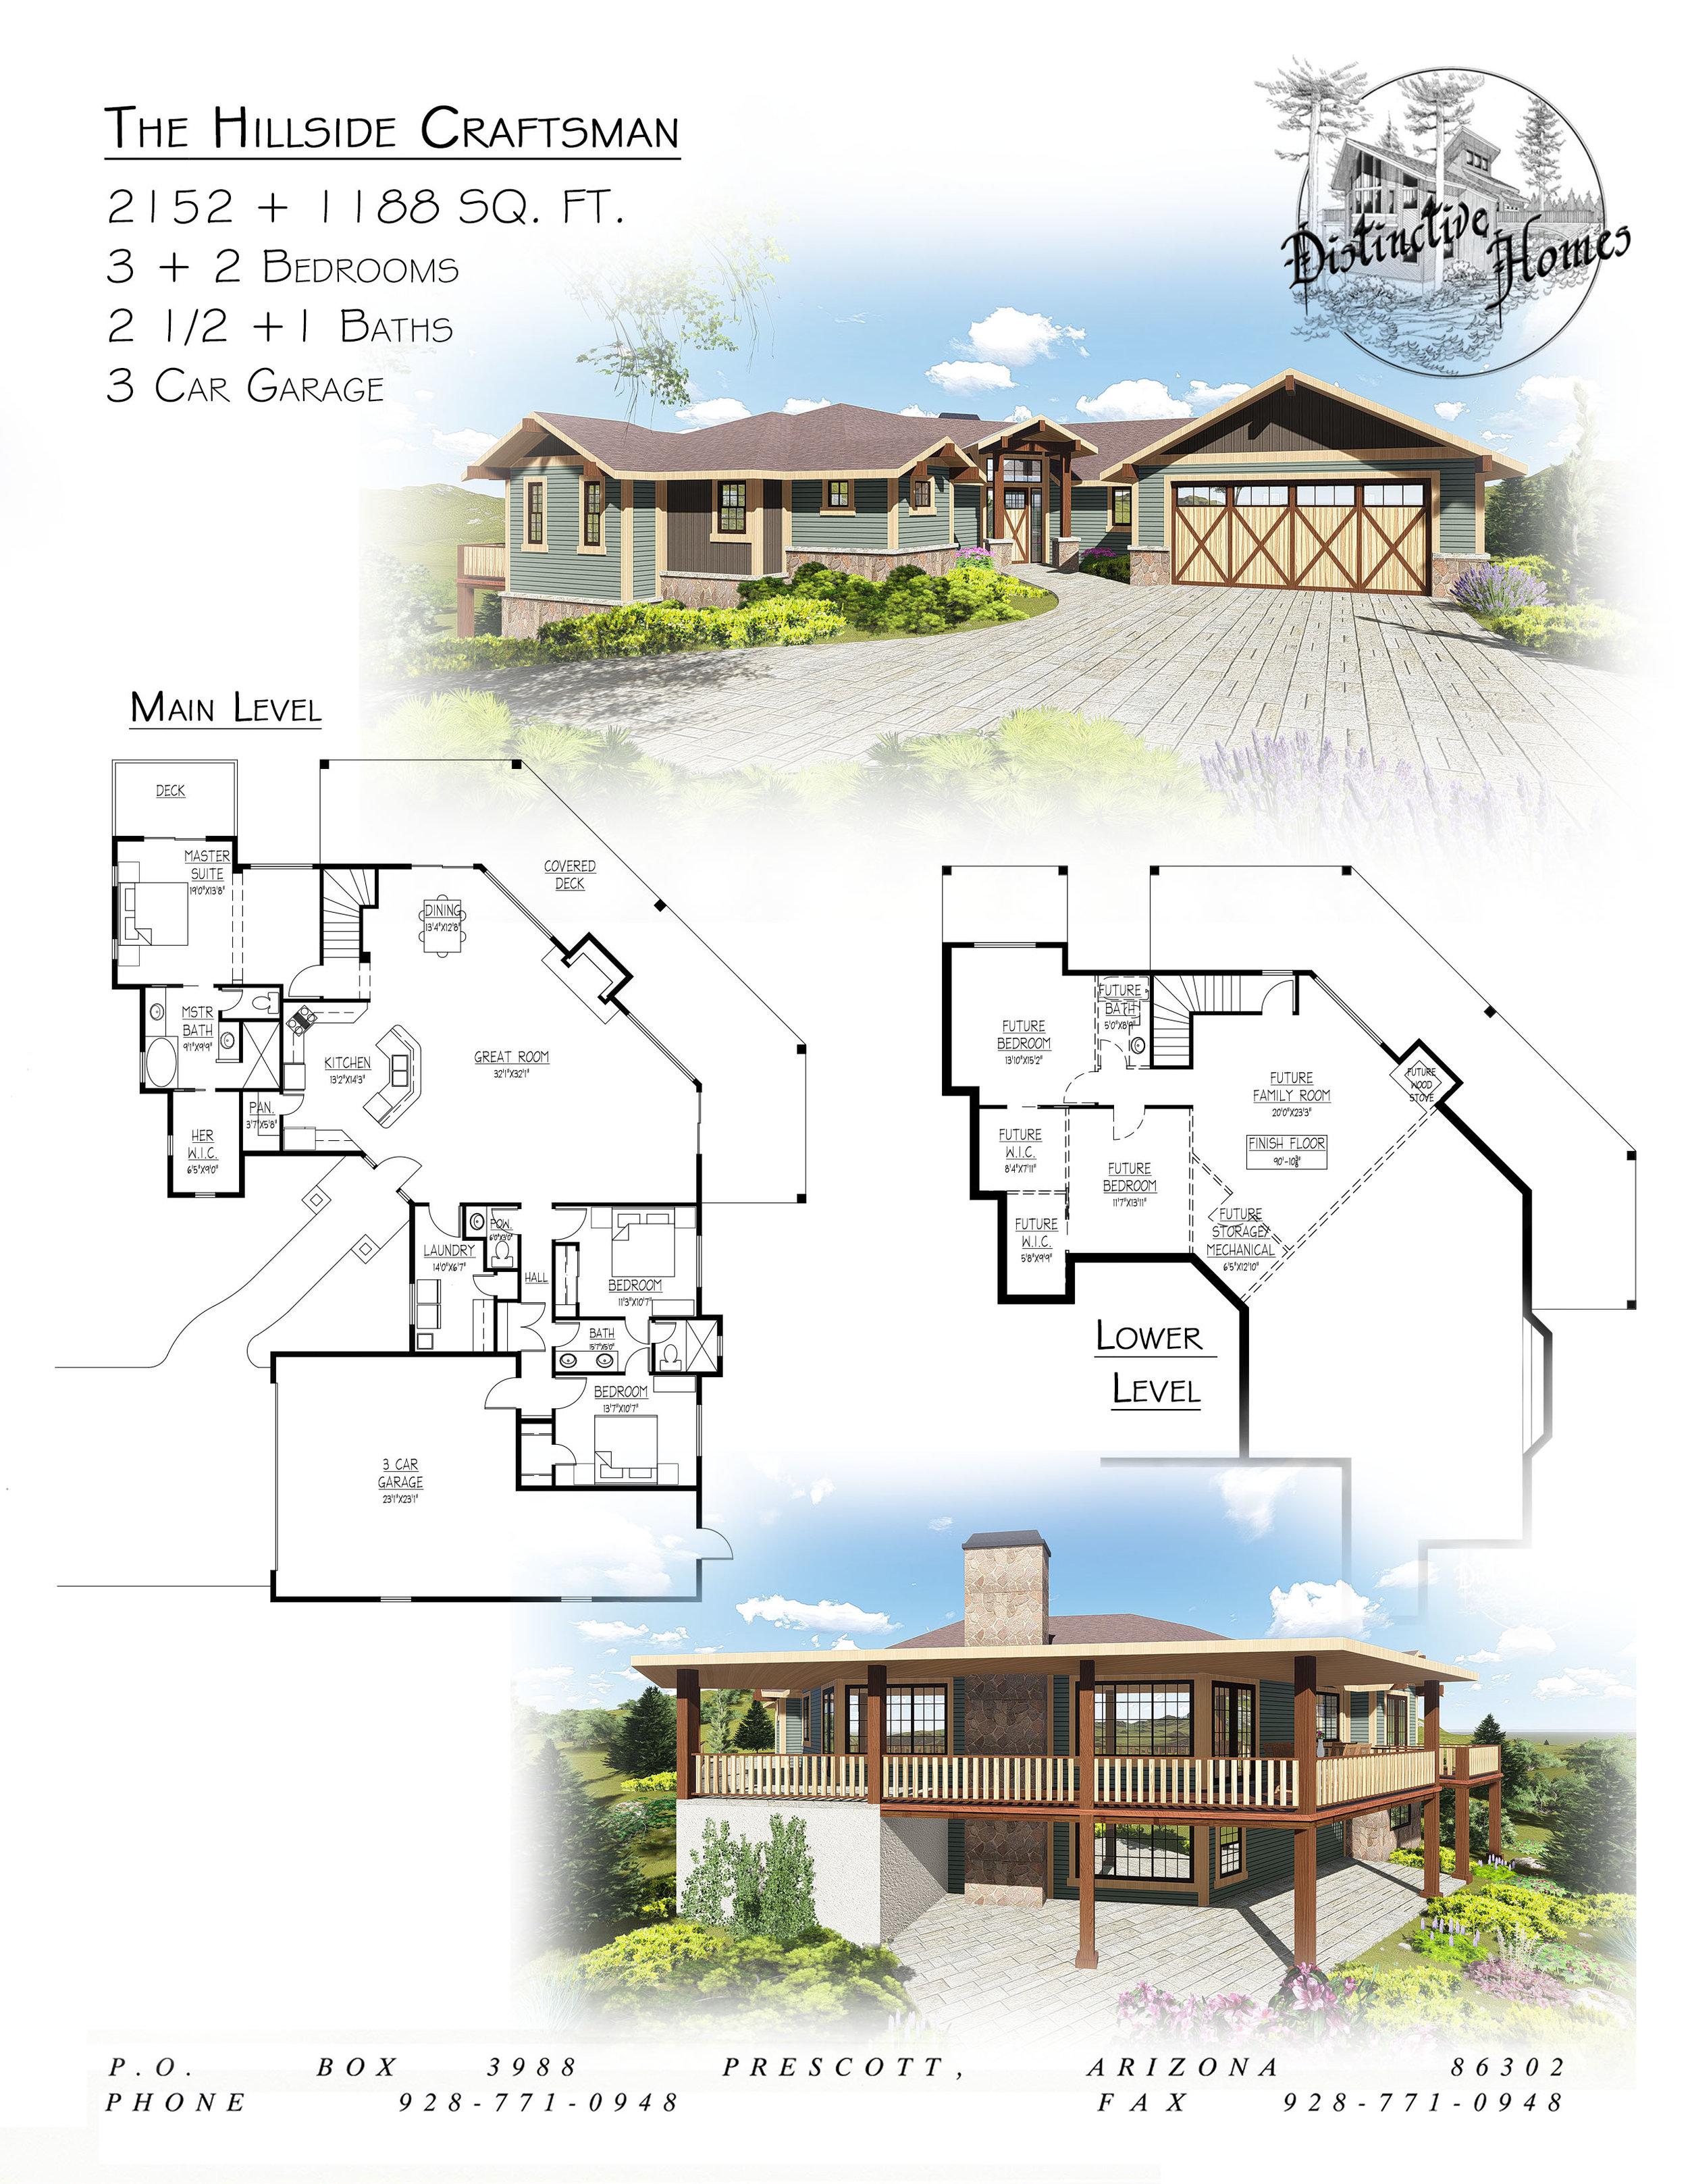 Presentation Hillside Craftsman.jpg